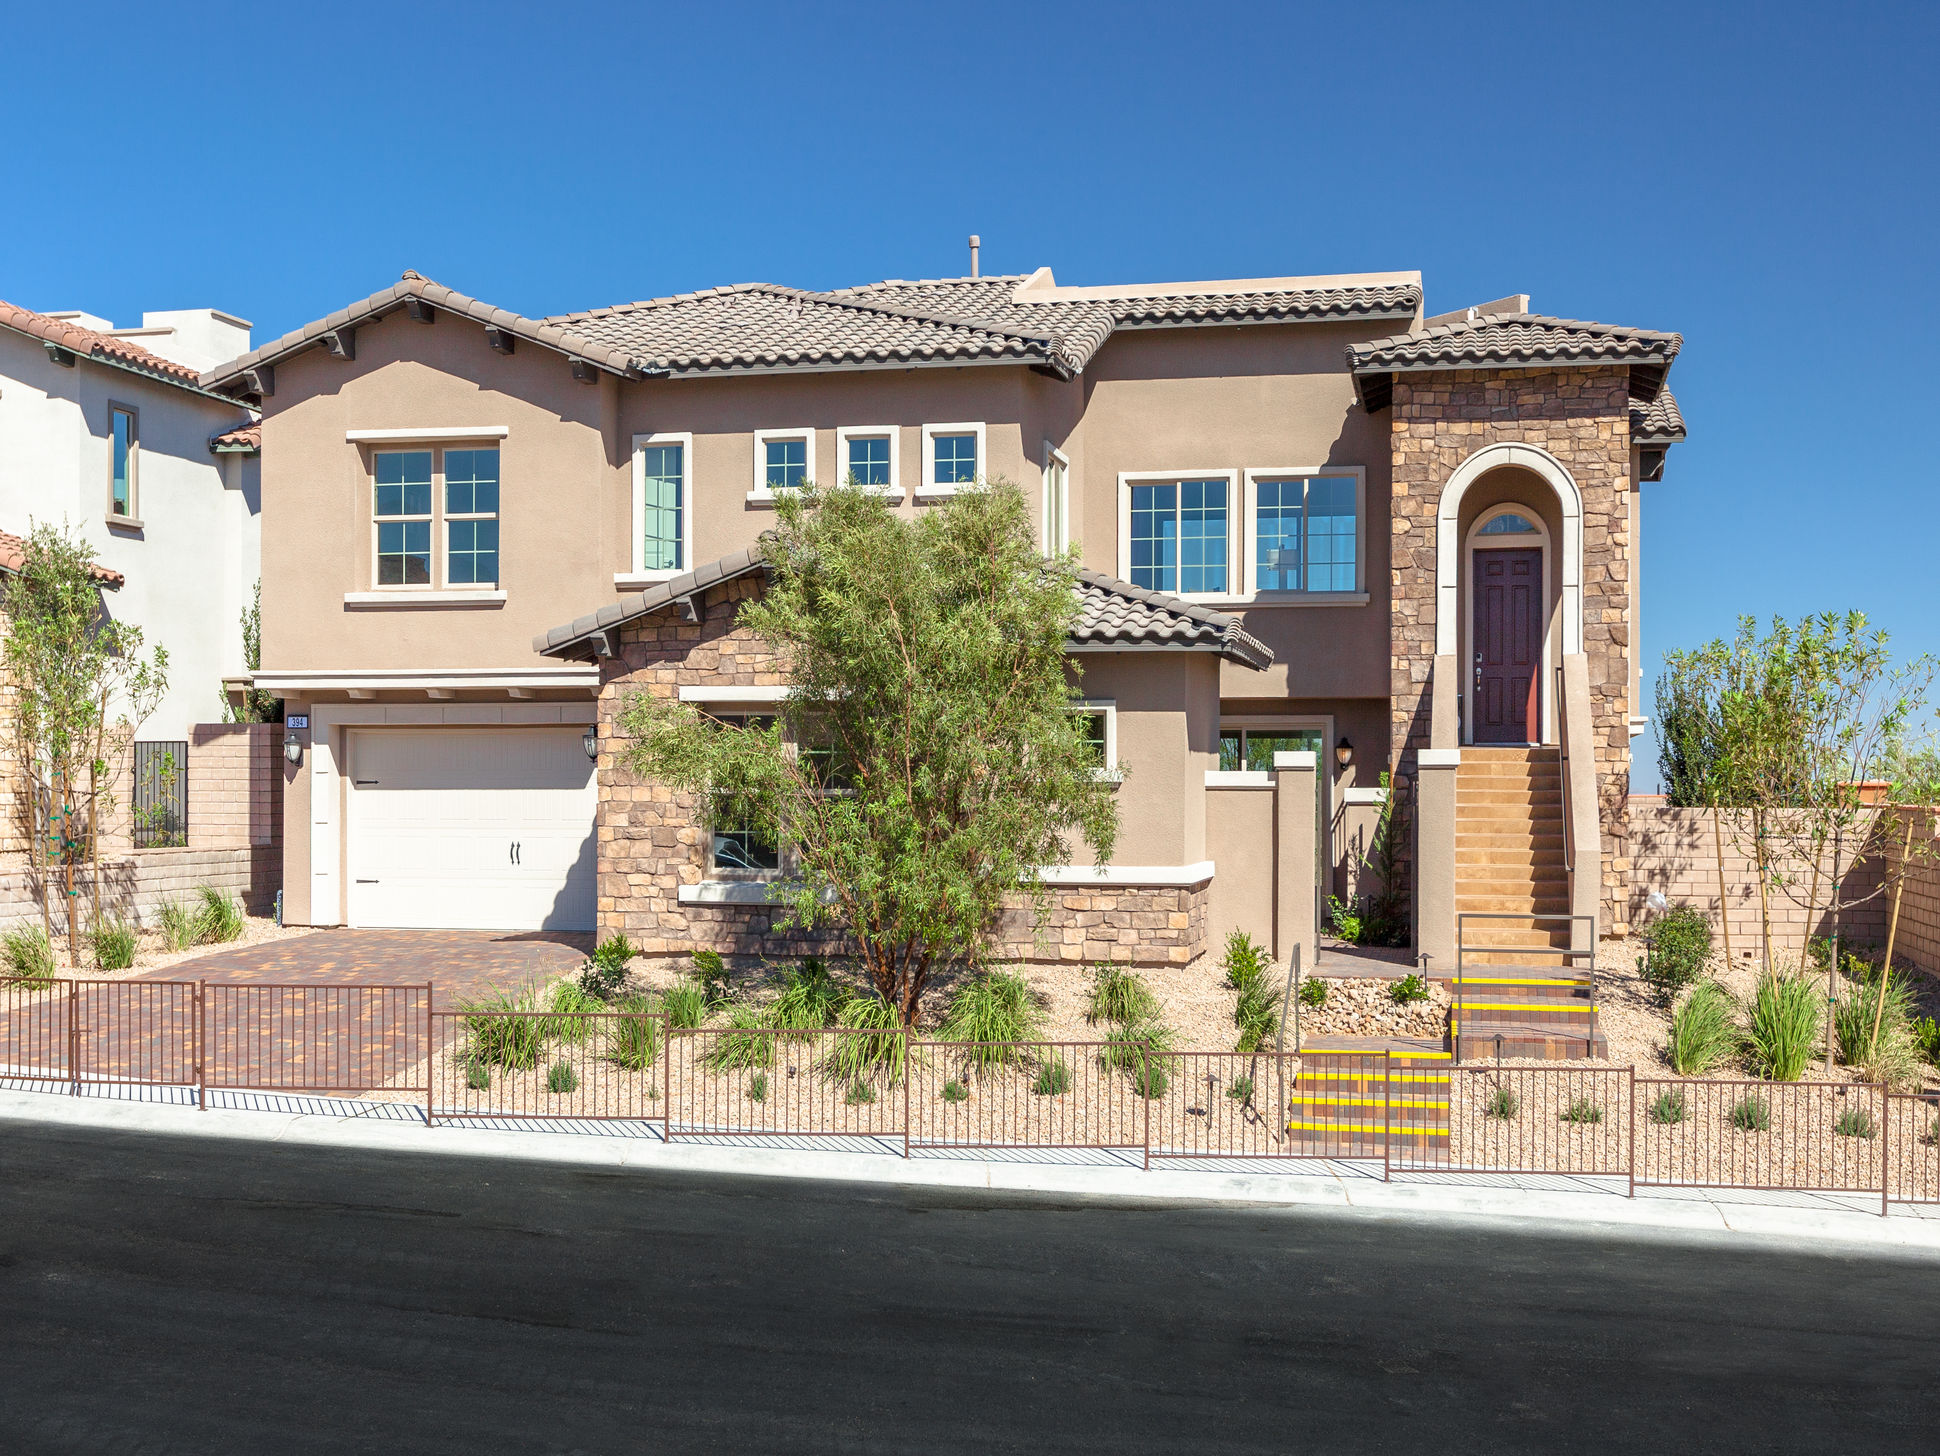 Fullsize Of Calatlantic Homes Reviews